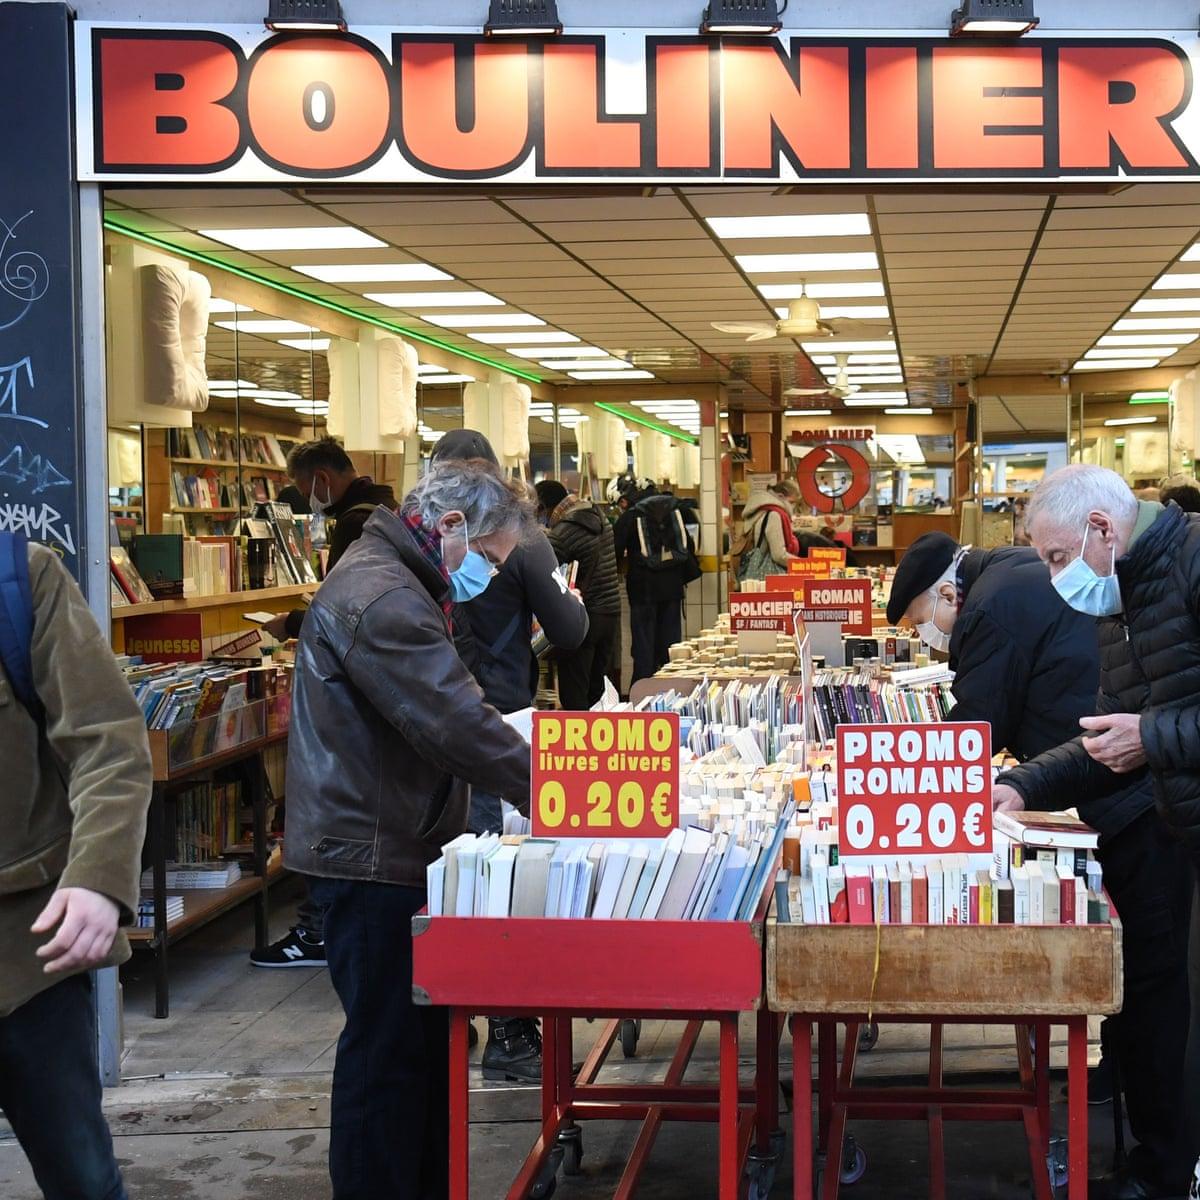 Parisians: 'We love Britain's culture, its energy, its people. It's sad you  don't love us too' | Politics | The Guardian